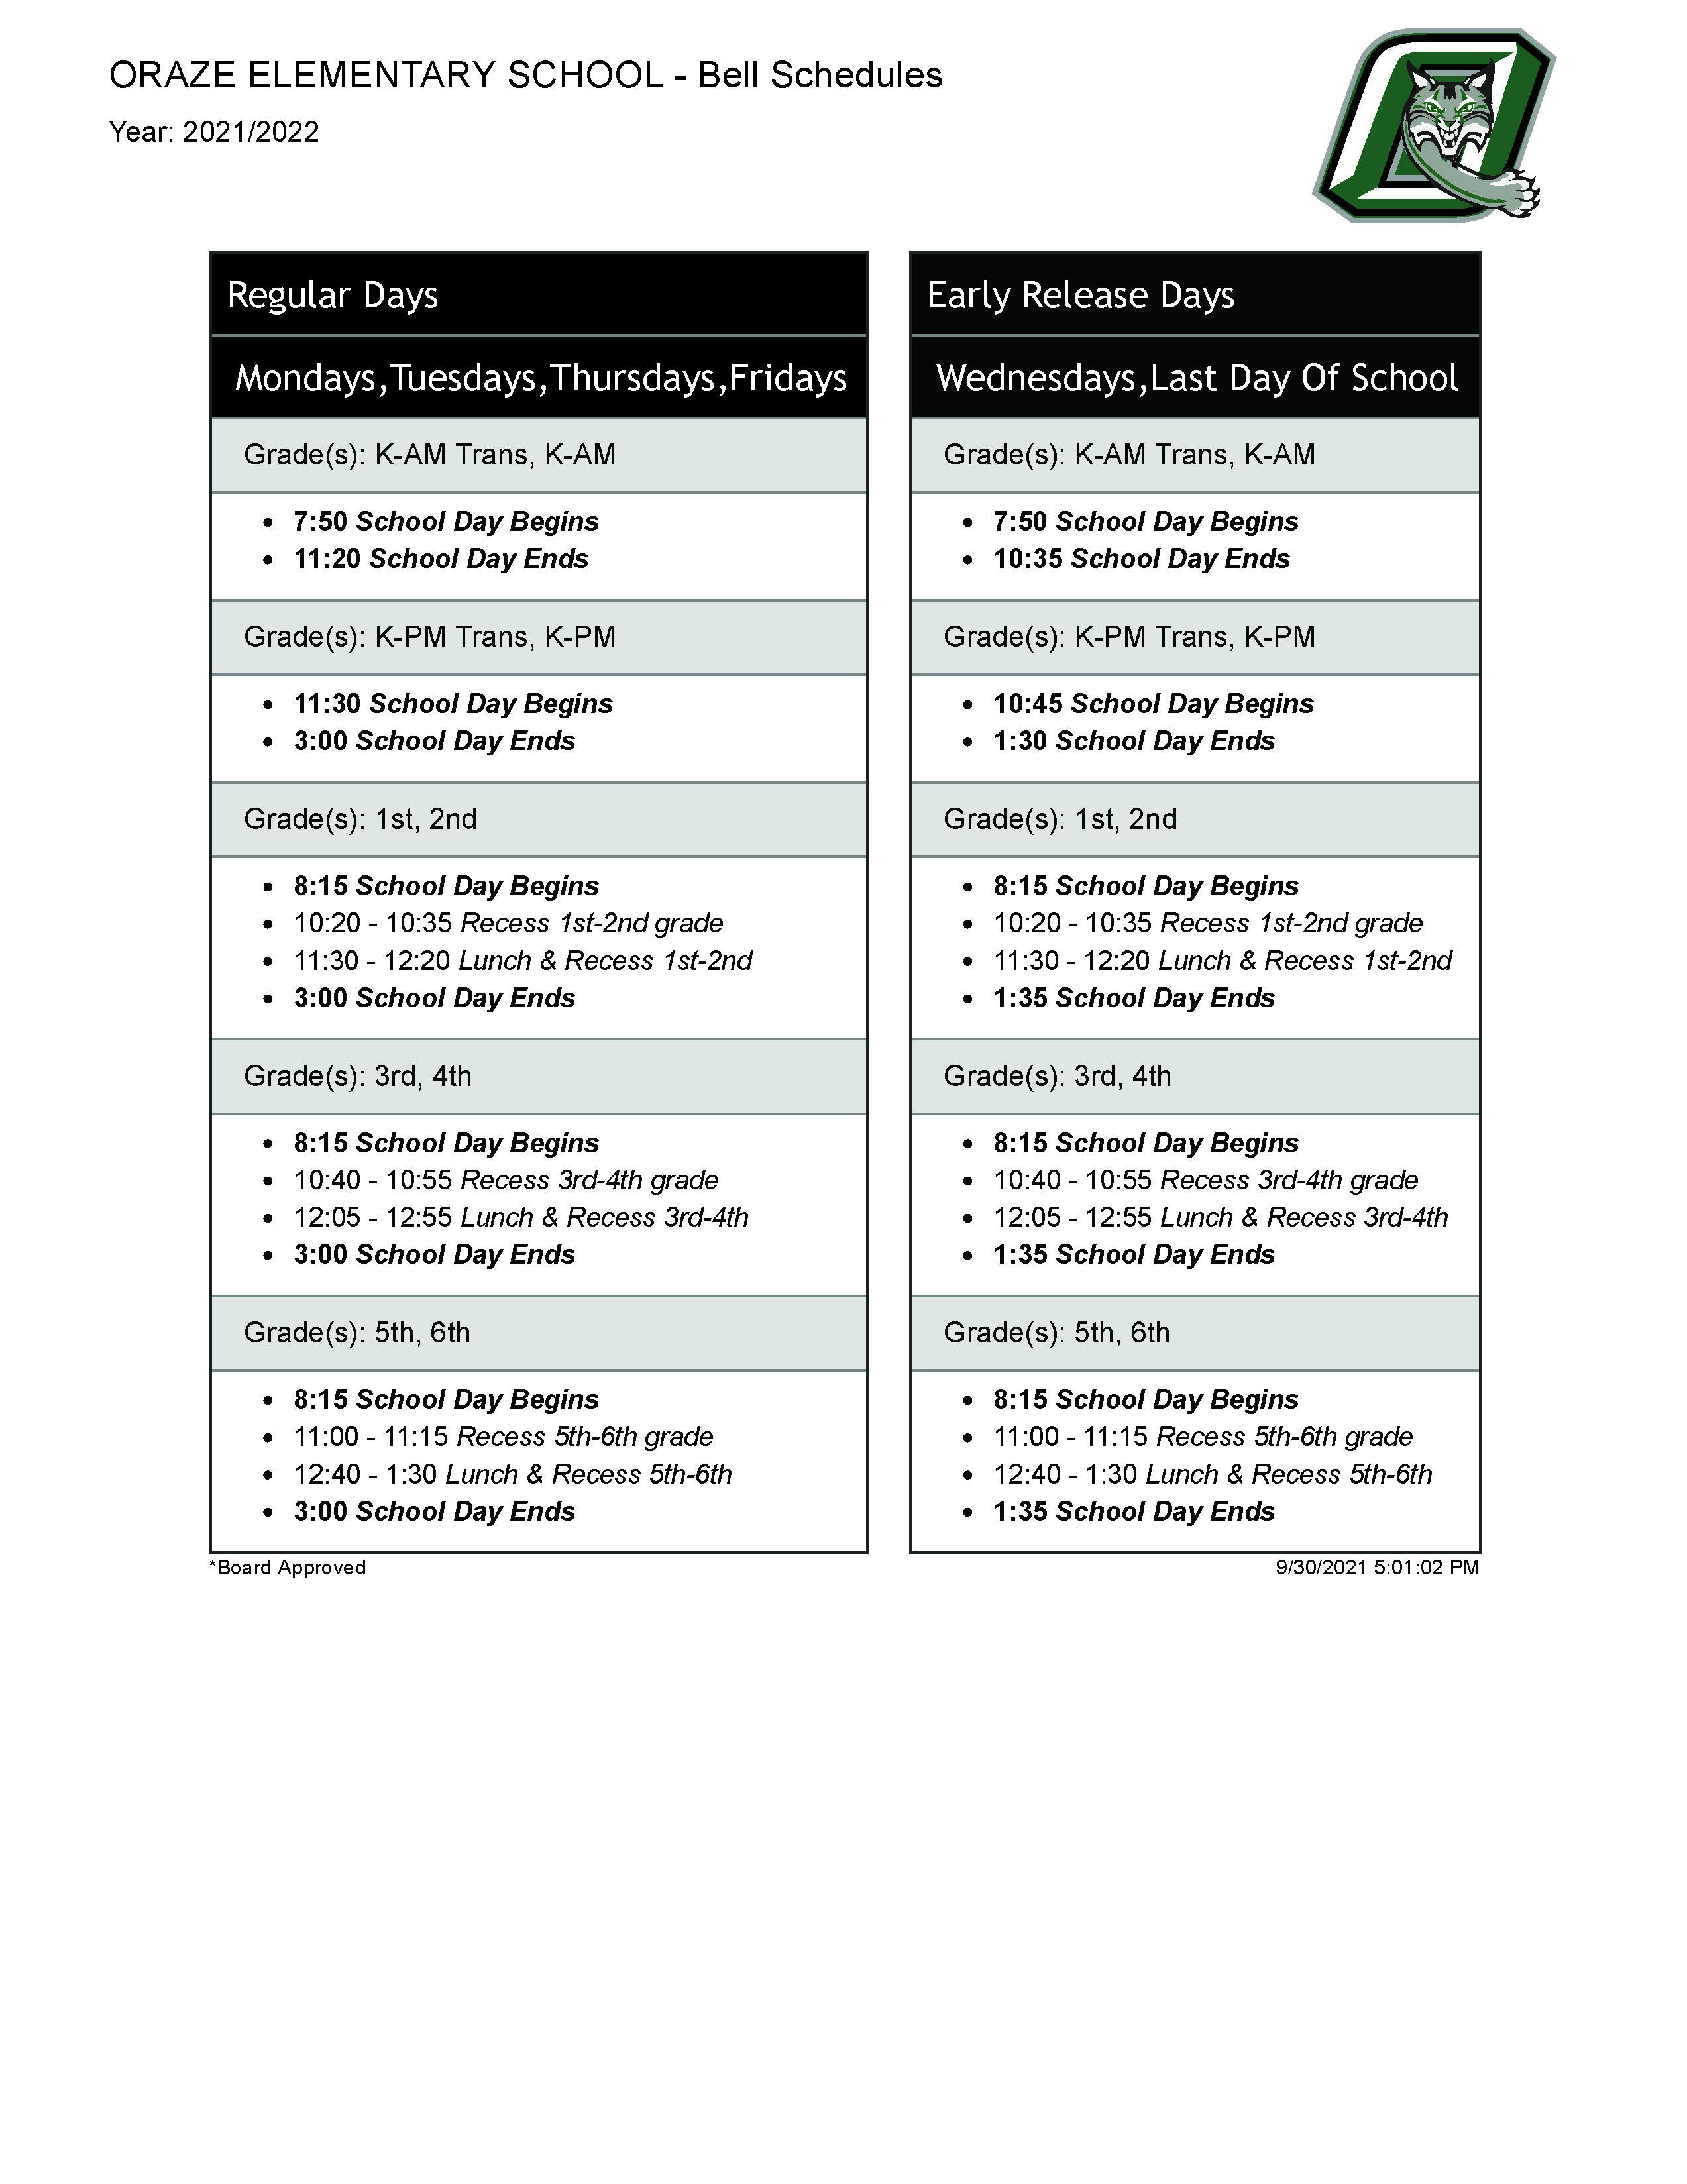 full bell schedule